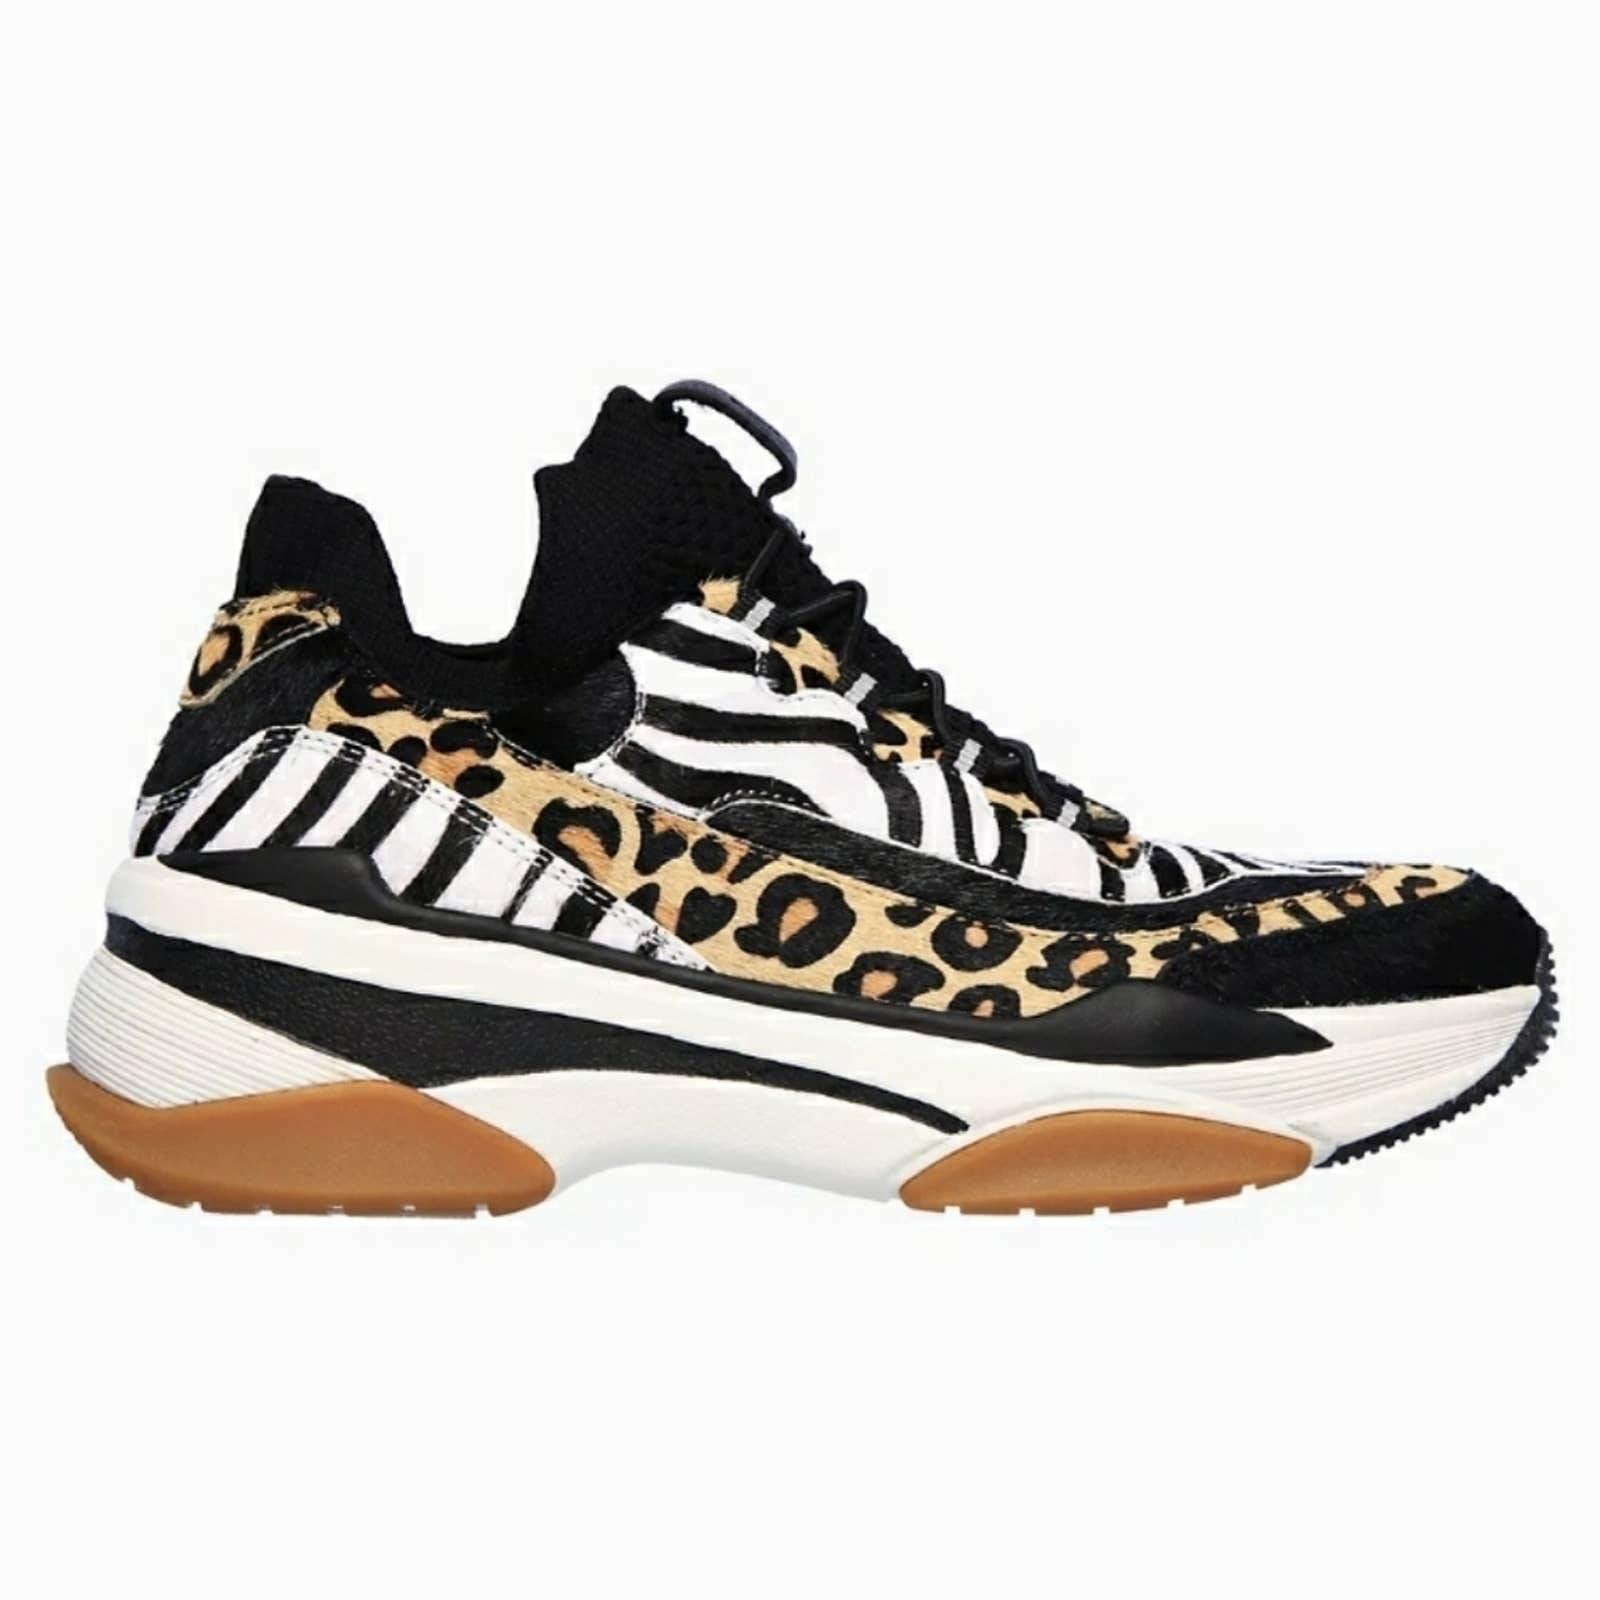 Marc Nason Griller Savage sneakers